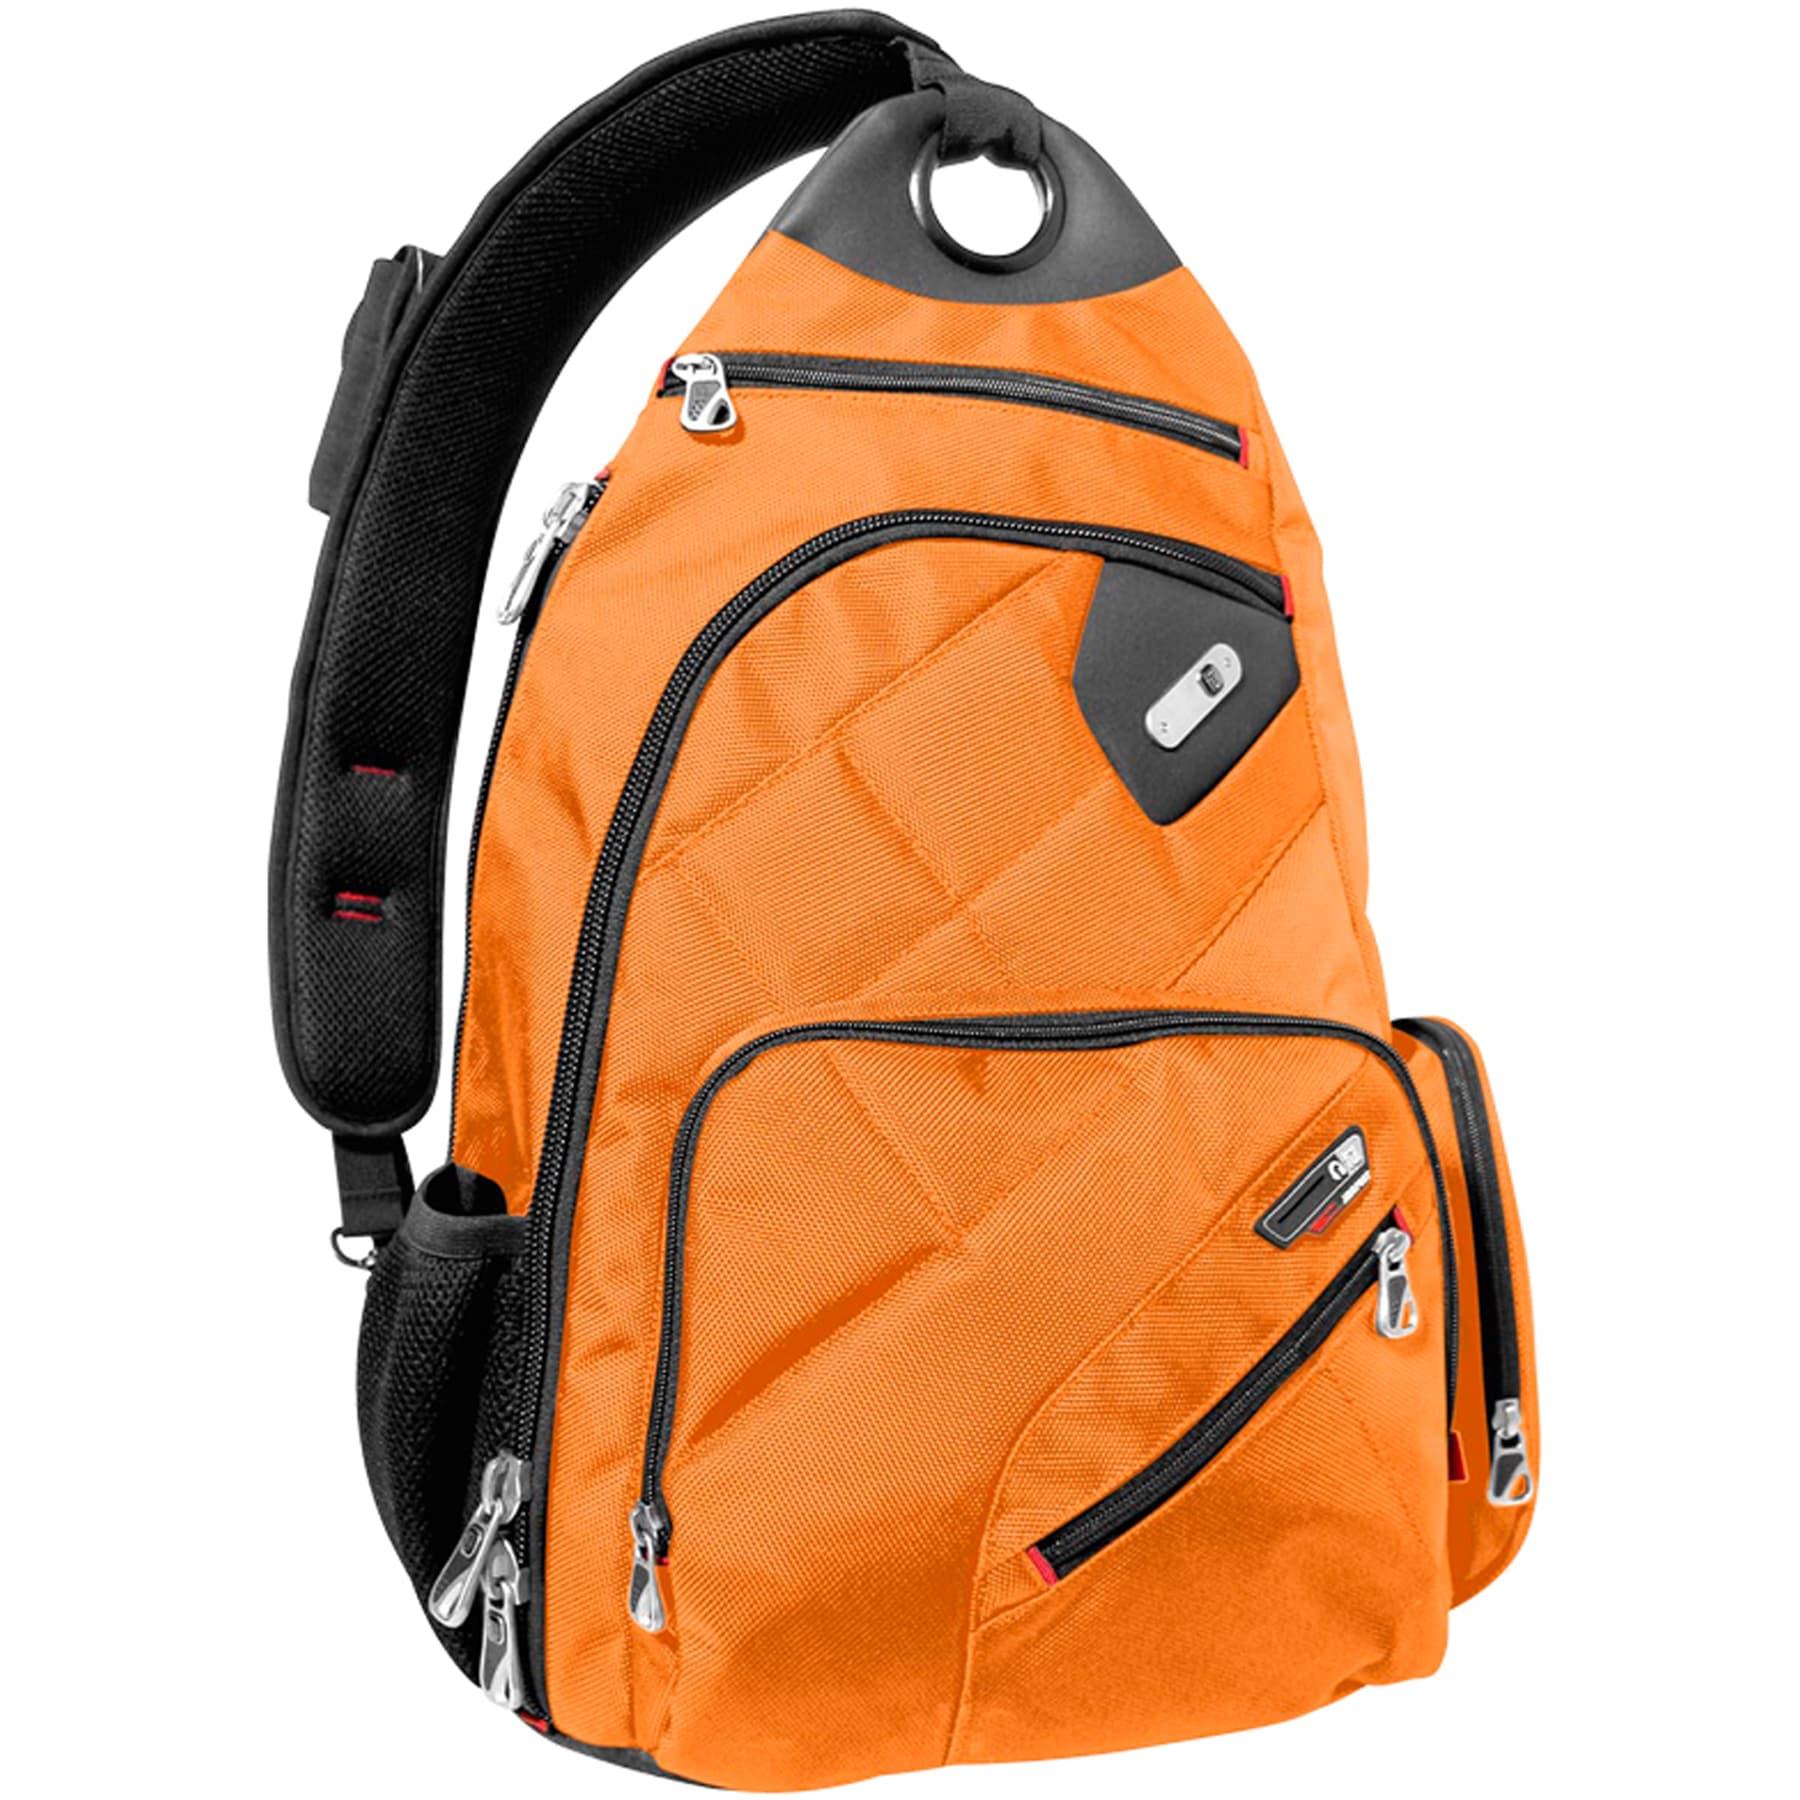 Ful Brick House Orange Laptop Sling Backpack with Smart P...